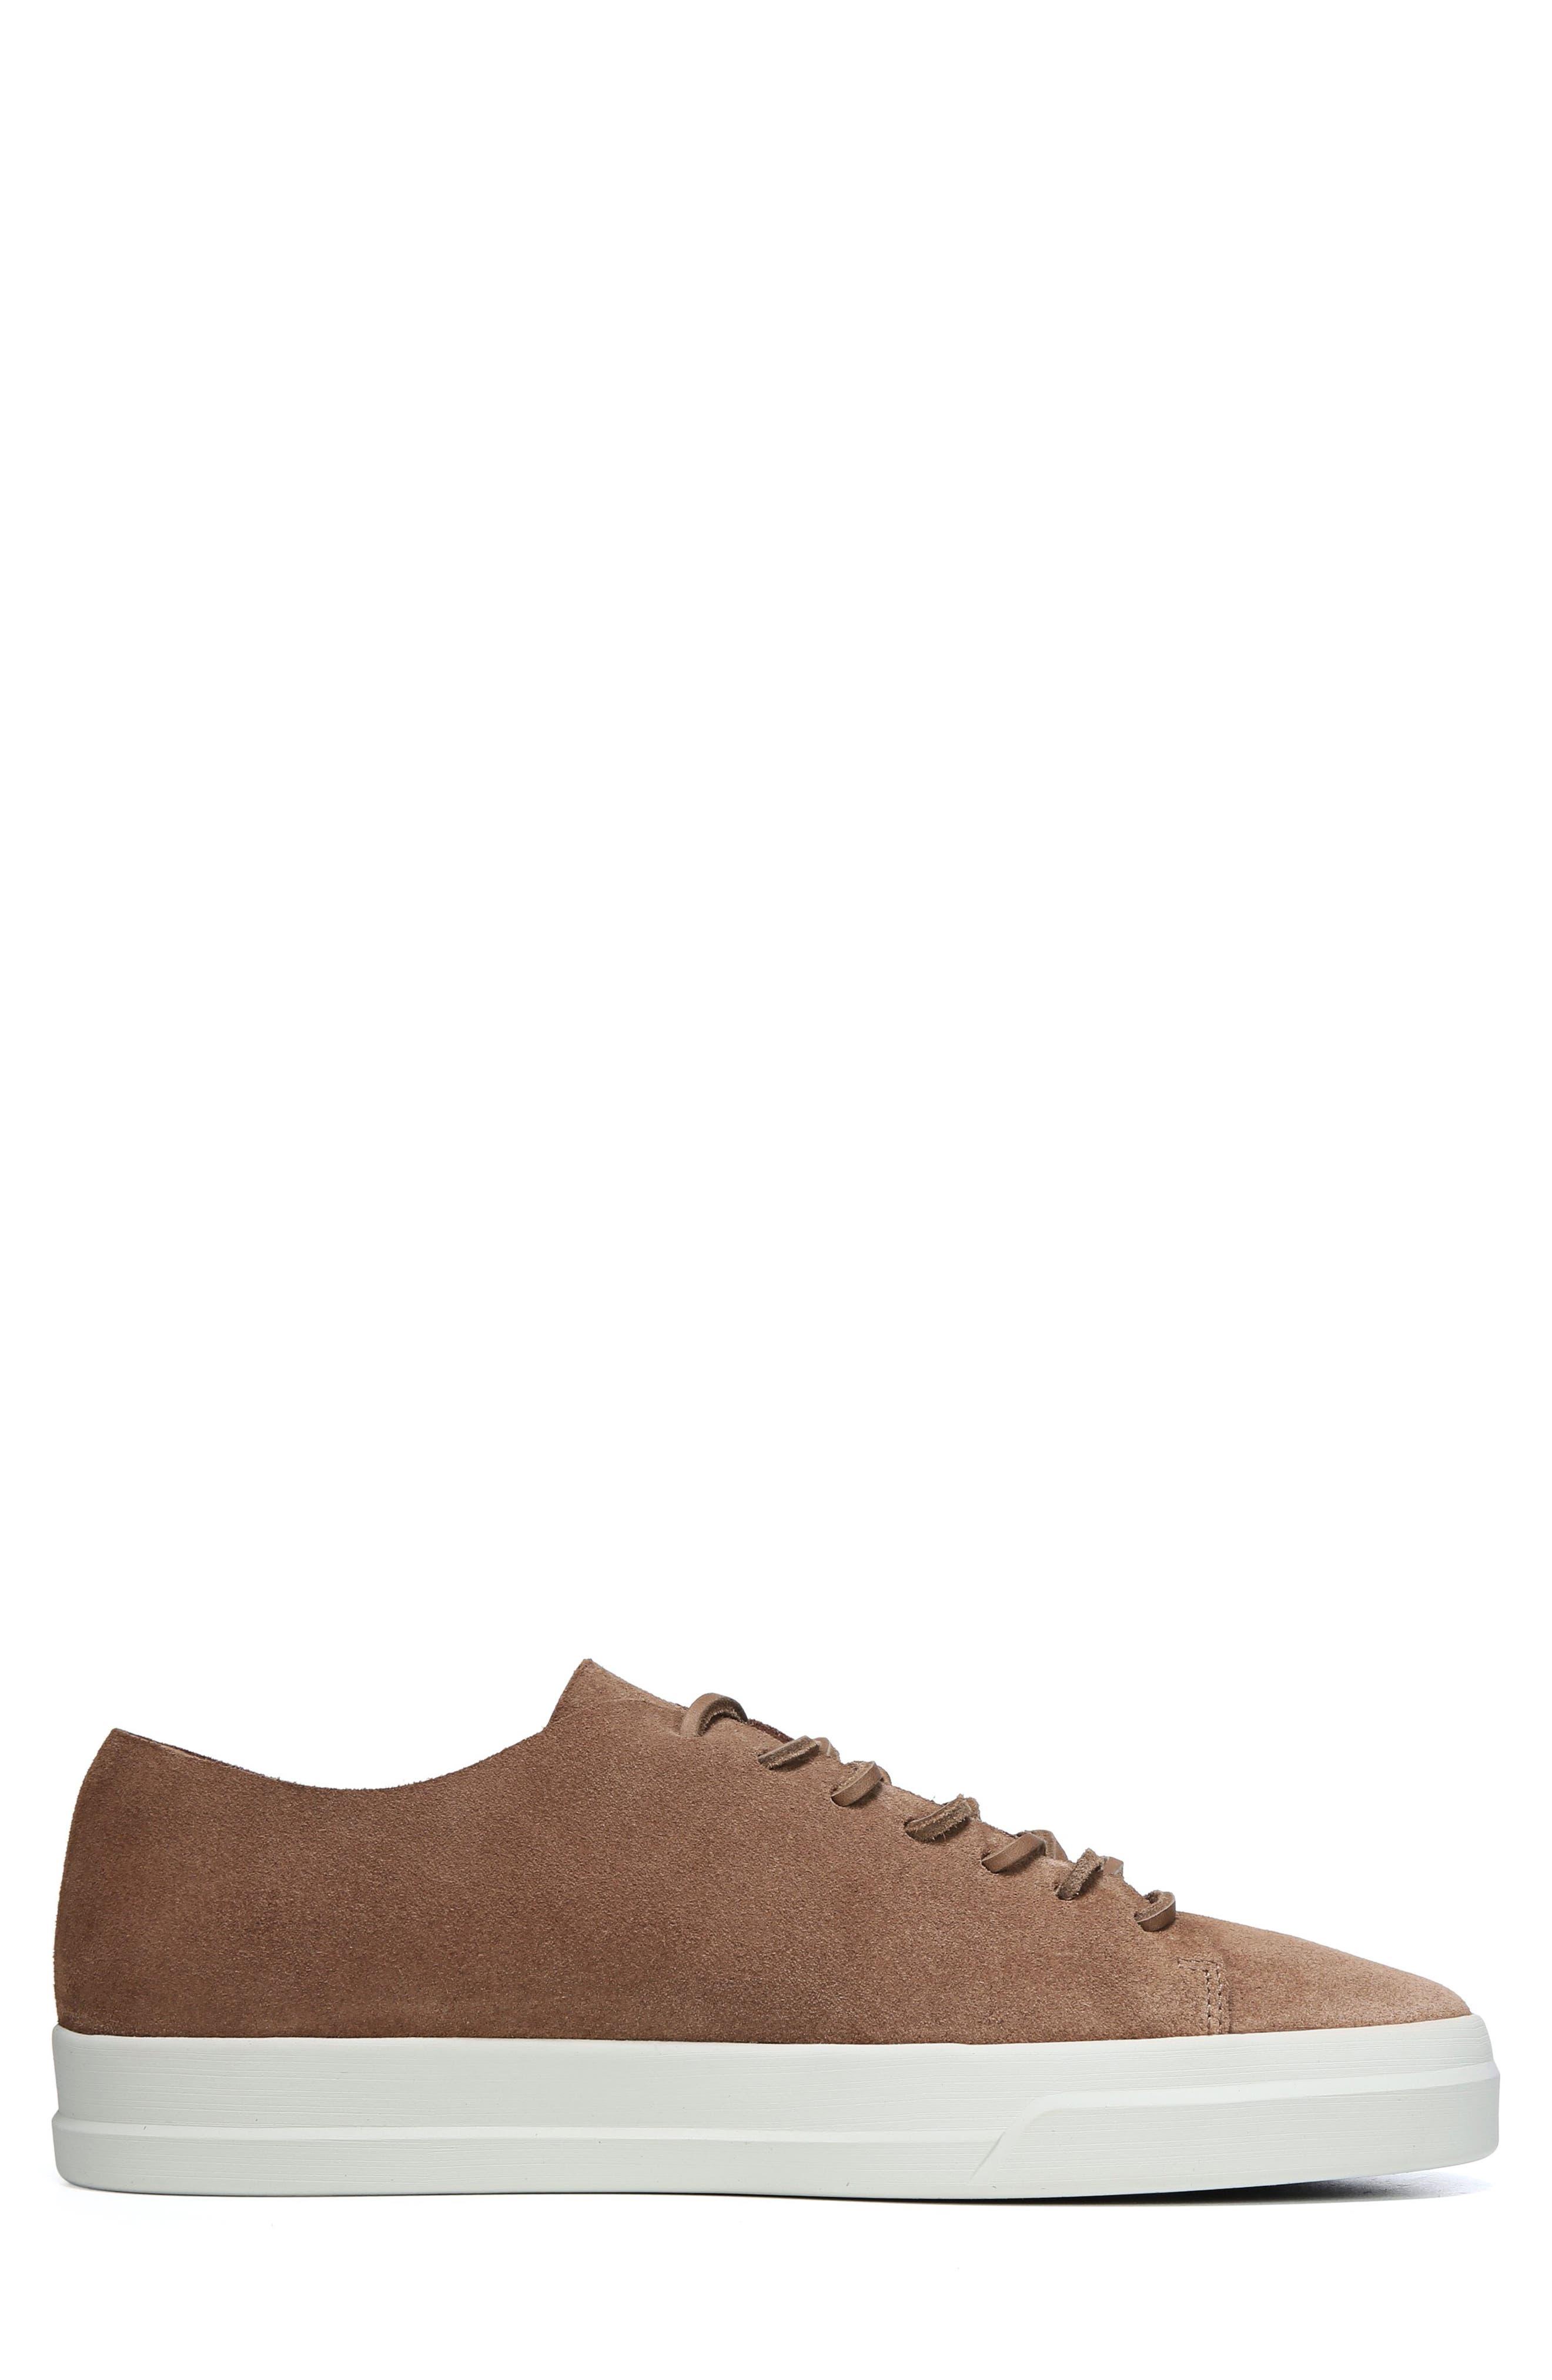 Copeland Sneaker,                             Alternate thumbnail 3, color,                             CEDAR